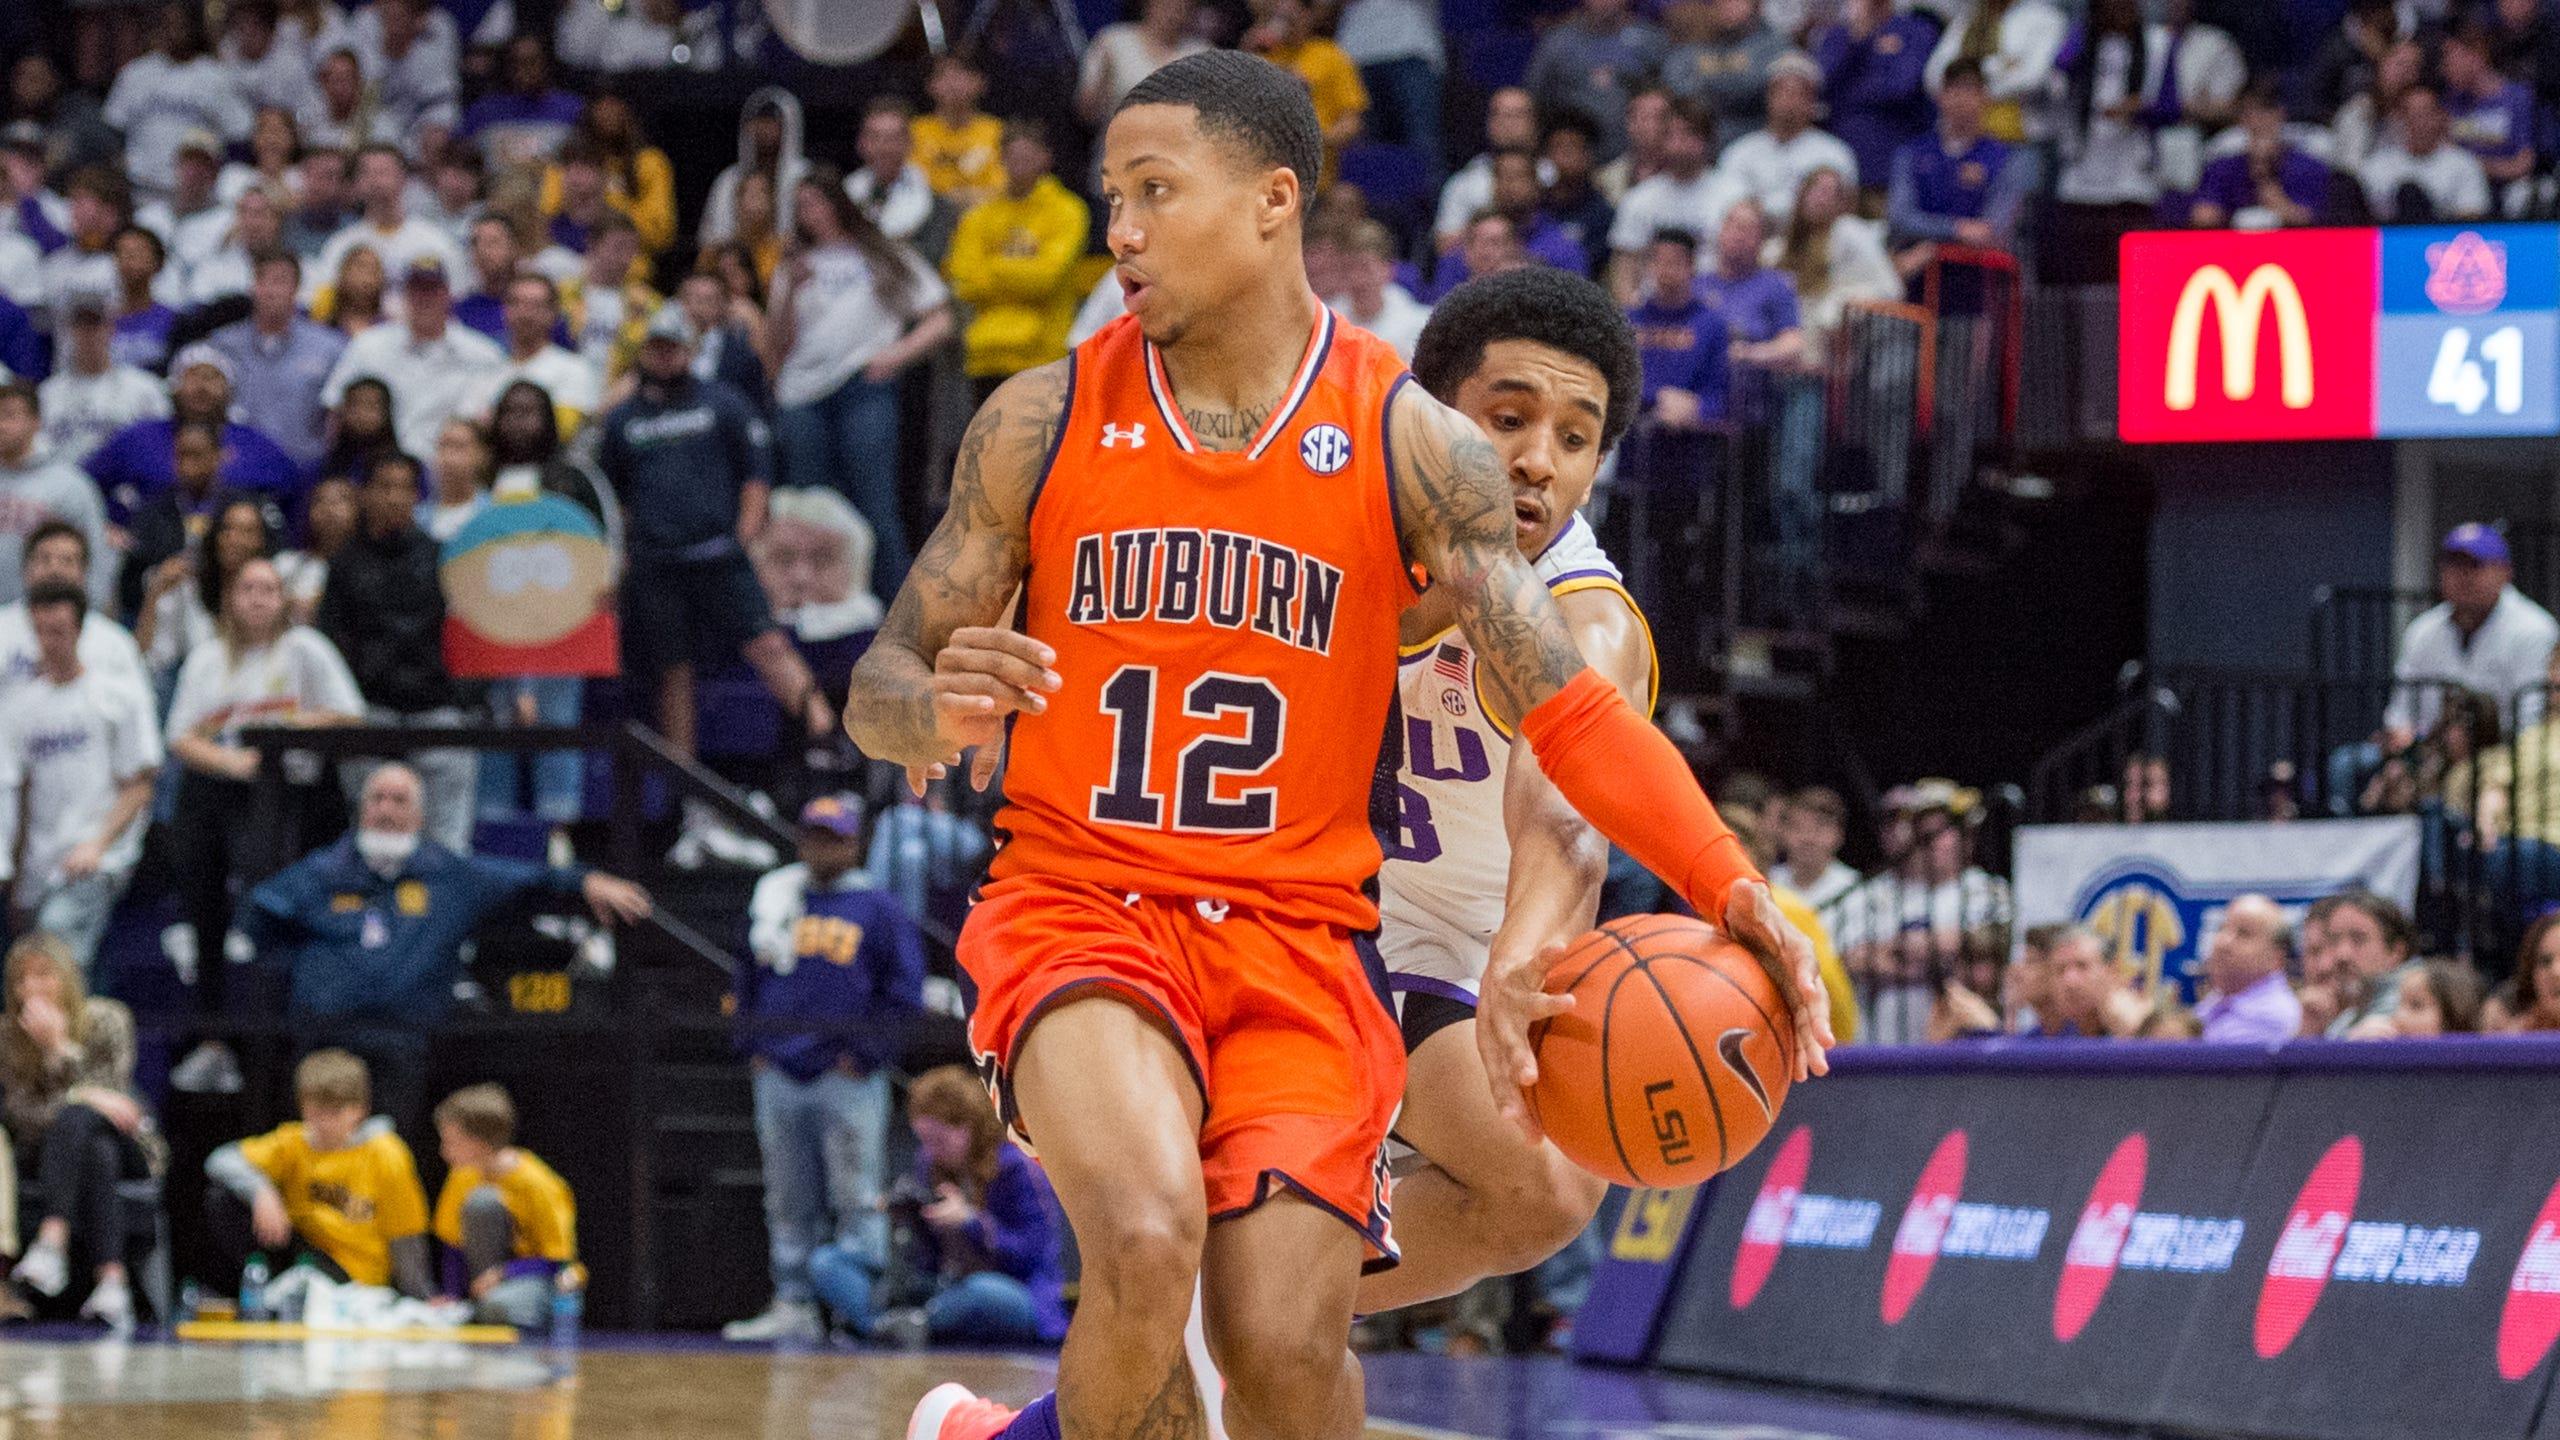 Photos Lsu Takes Down Auburn Basketball